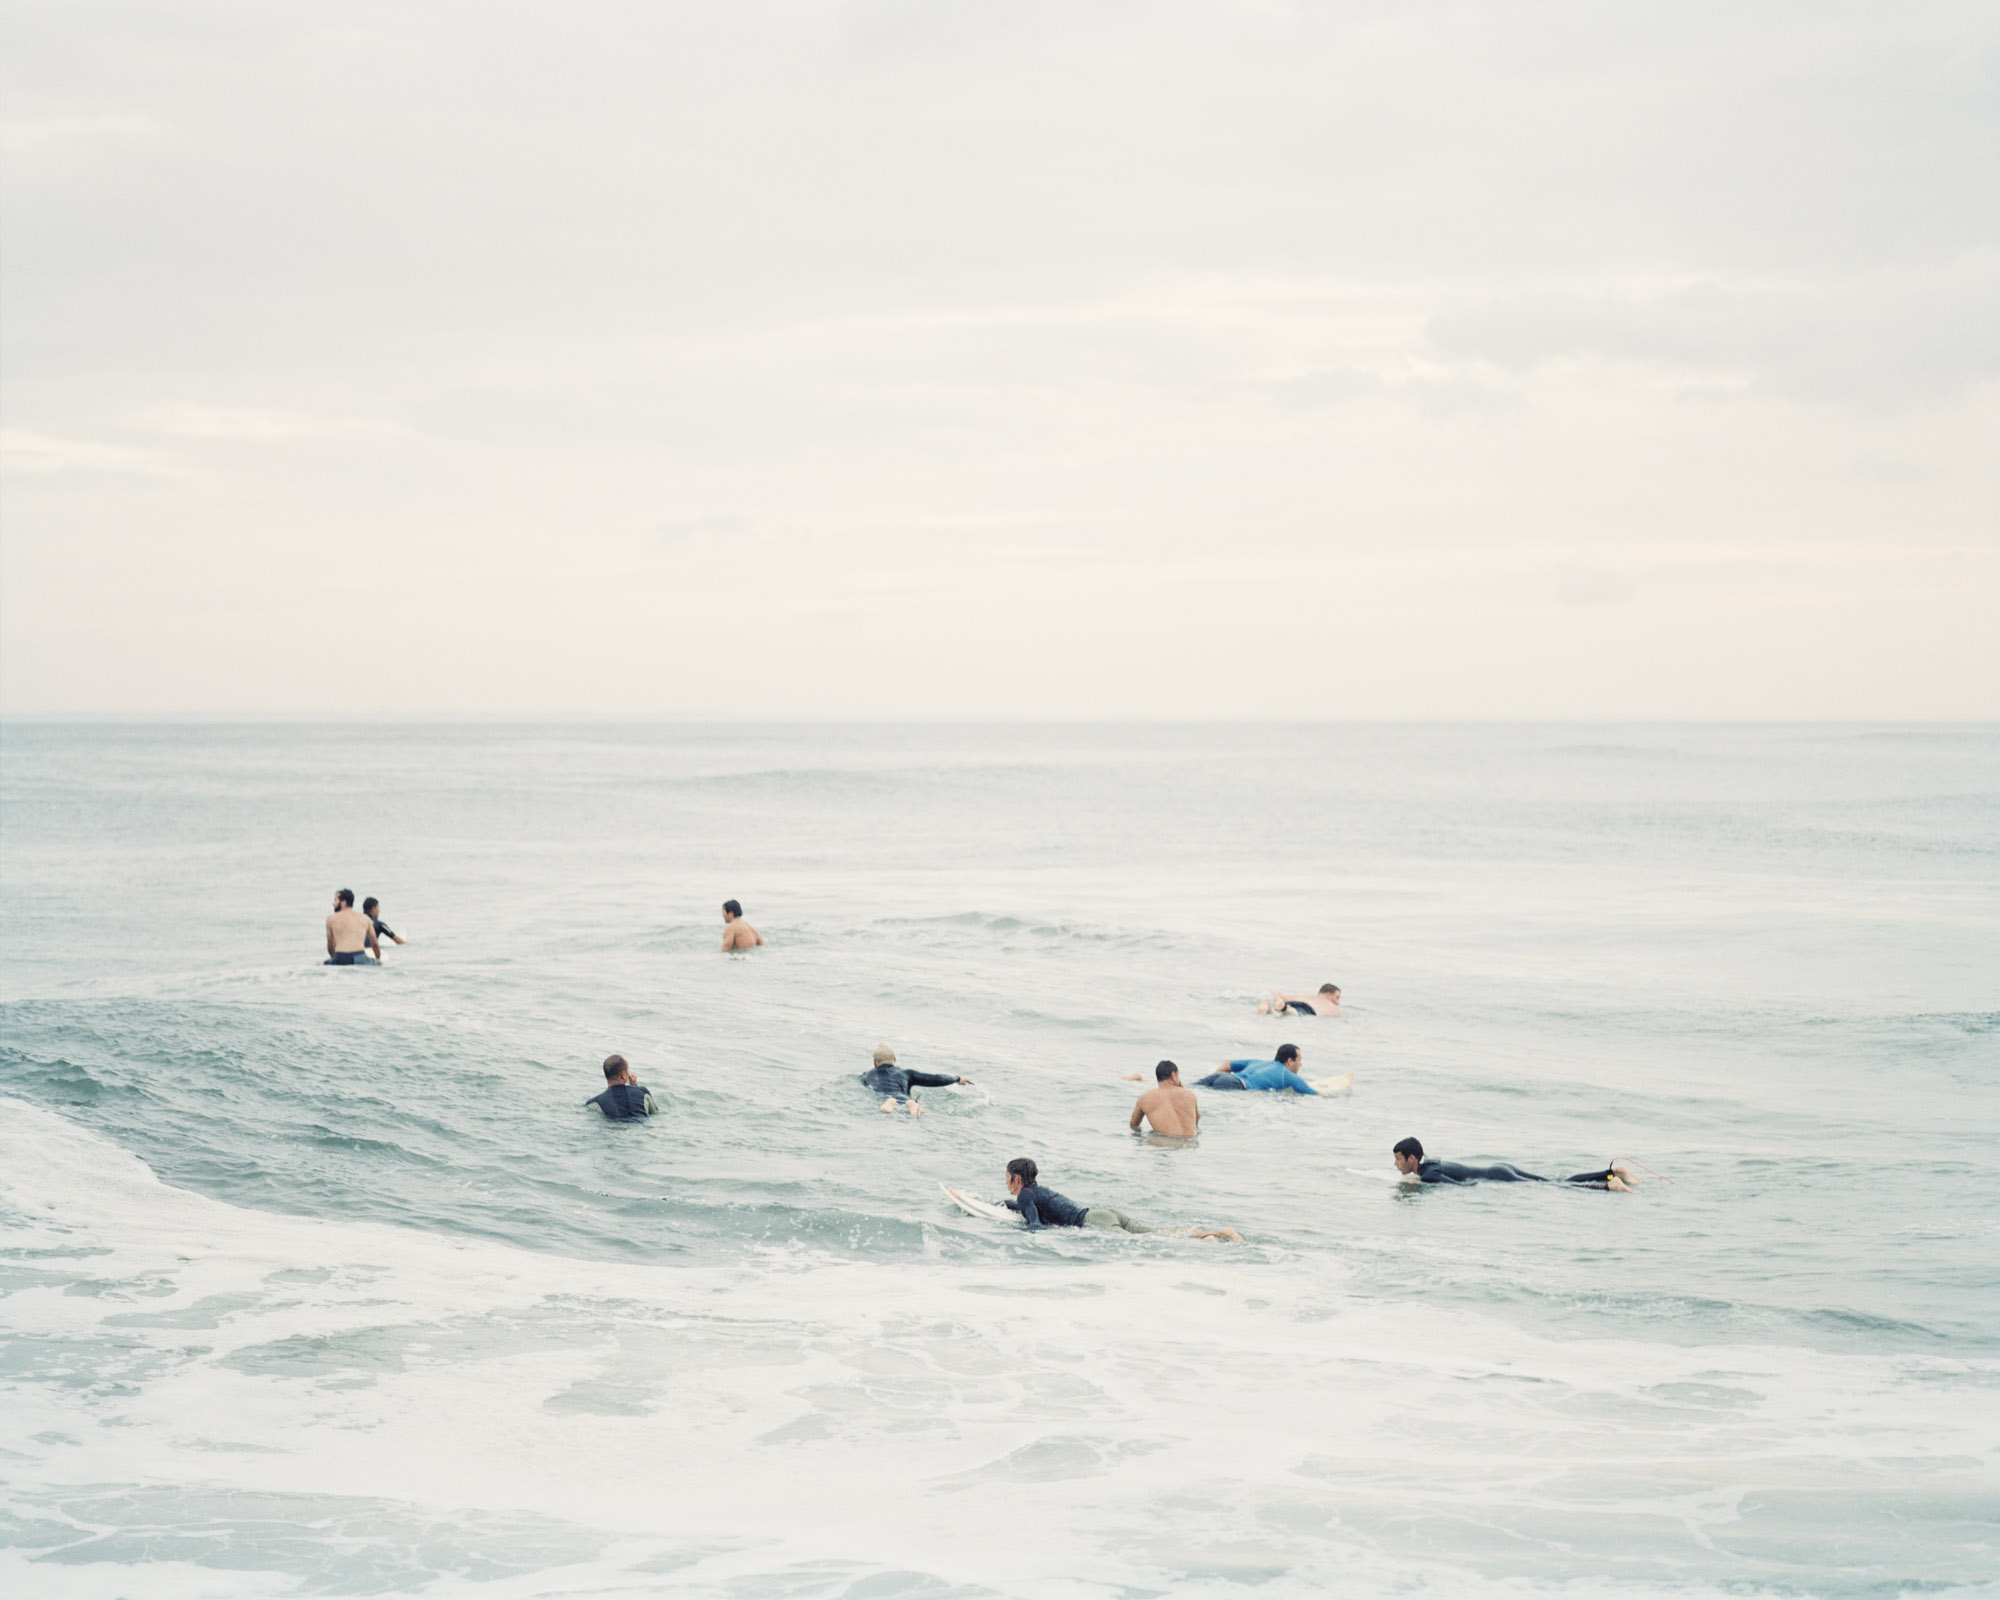 01_Surf 4 16x20-.jpg